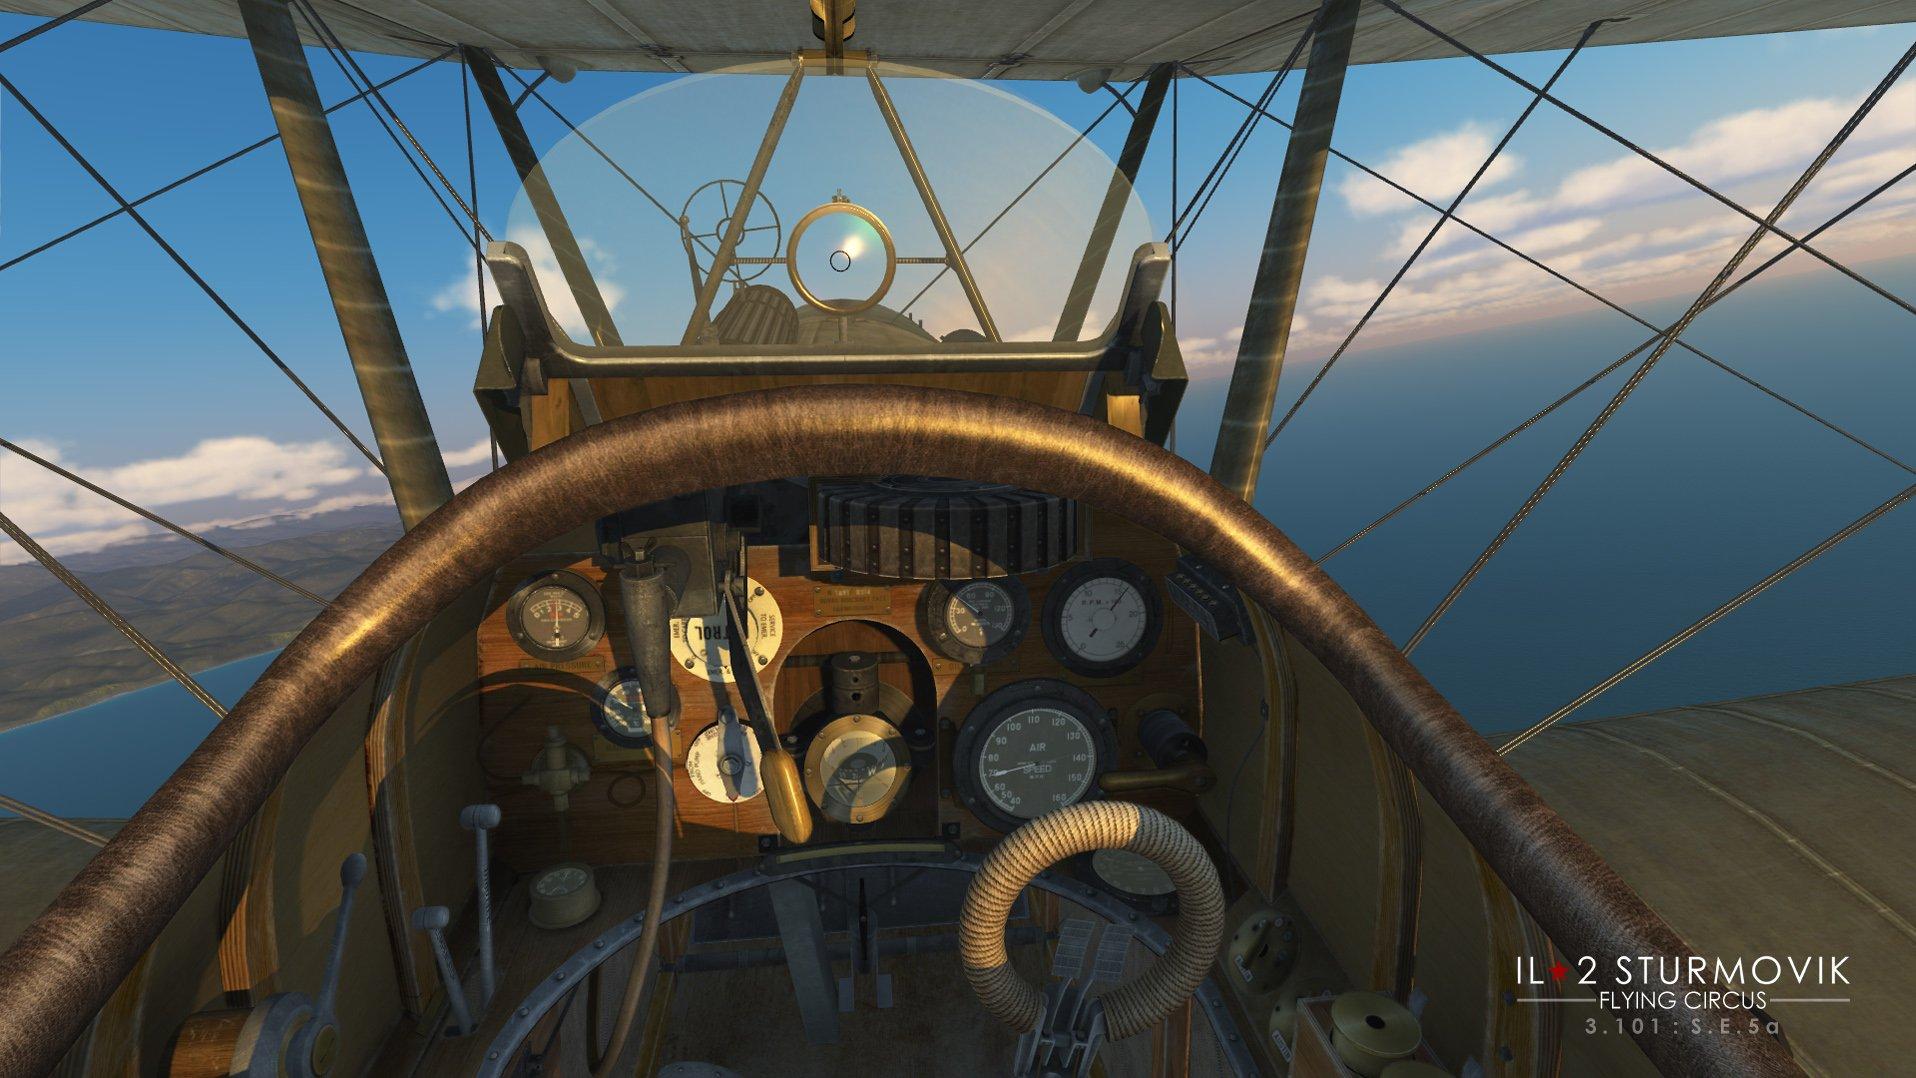 IL-2 Sturmovik: Flying Circus – Volume I